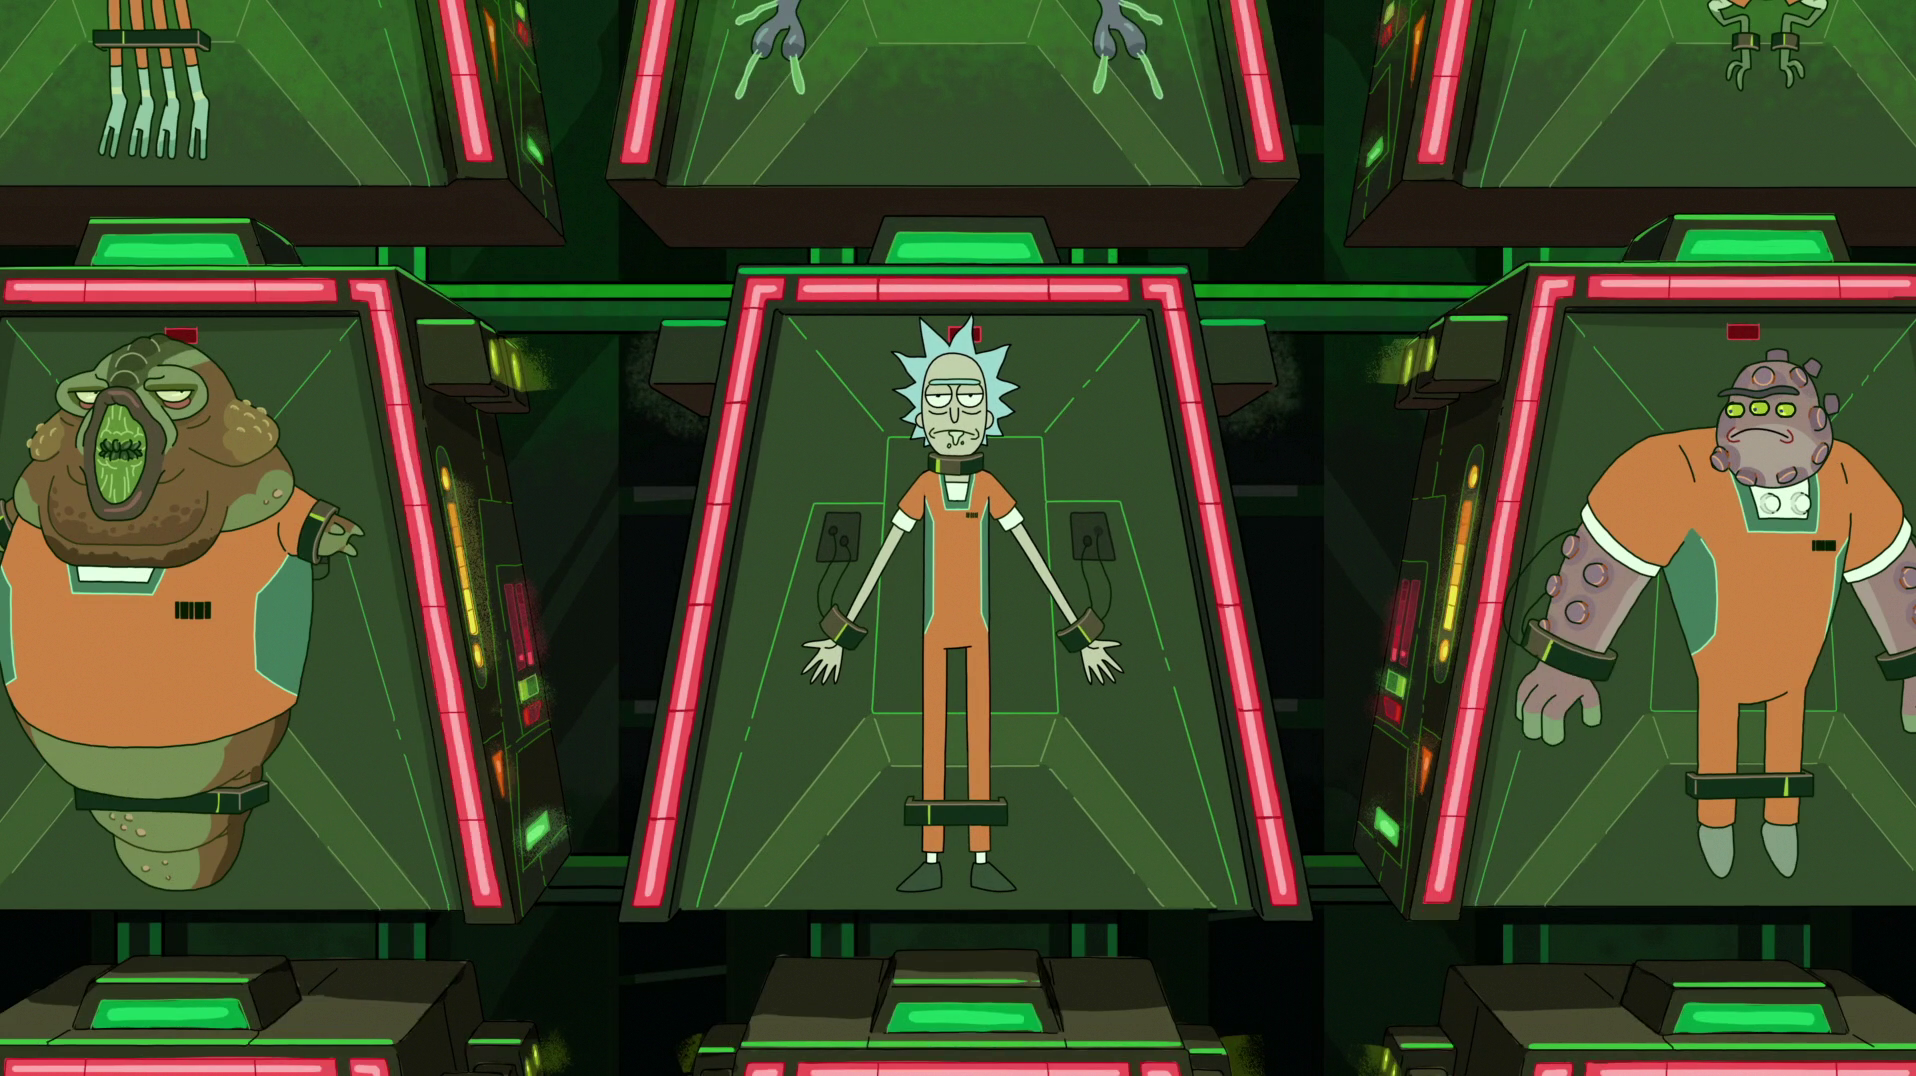 Rick & Morty Season 2 UNCENSORED 1080p (WEB-DL 5 1 AC-3) MP4